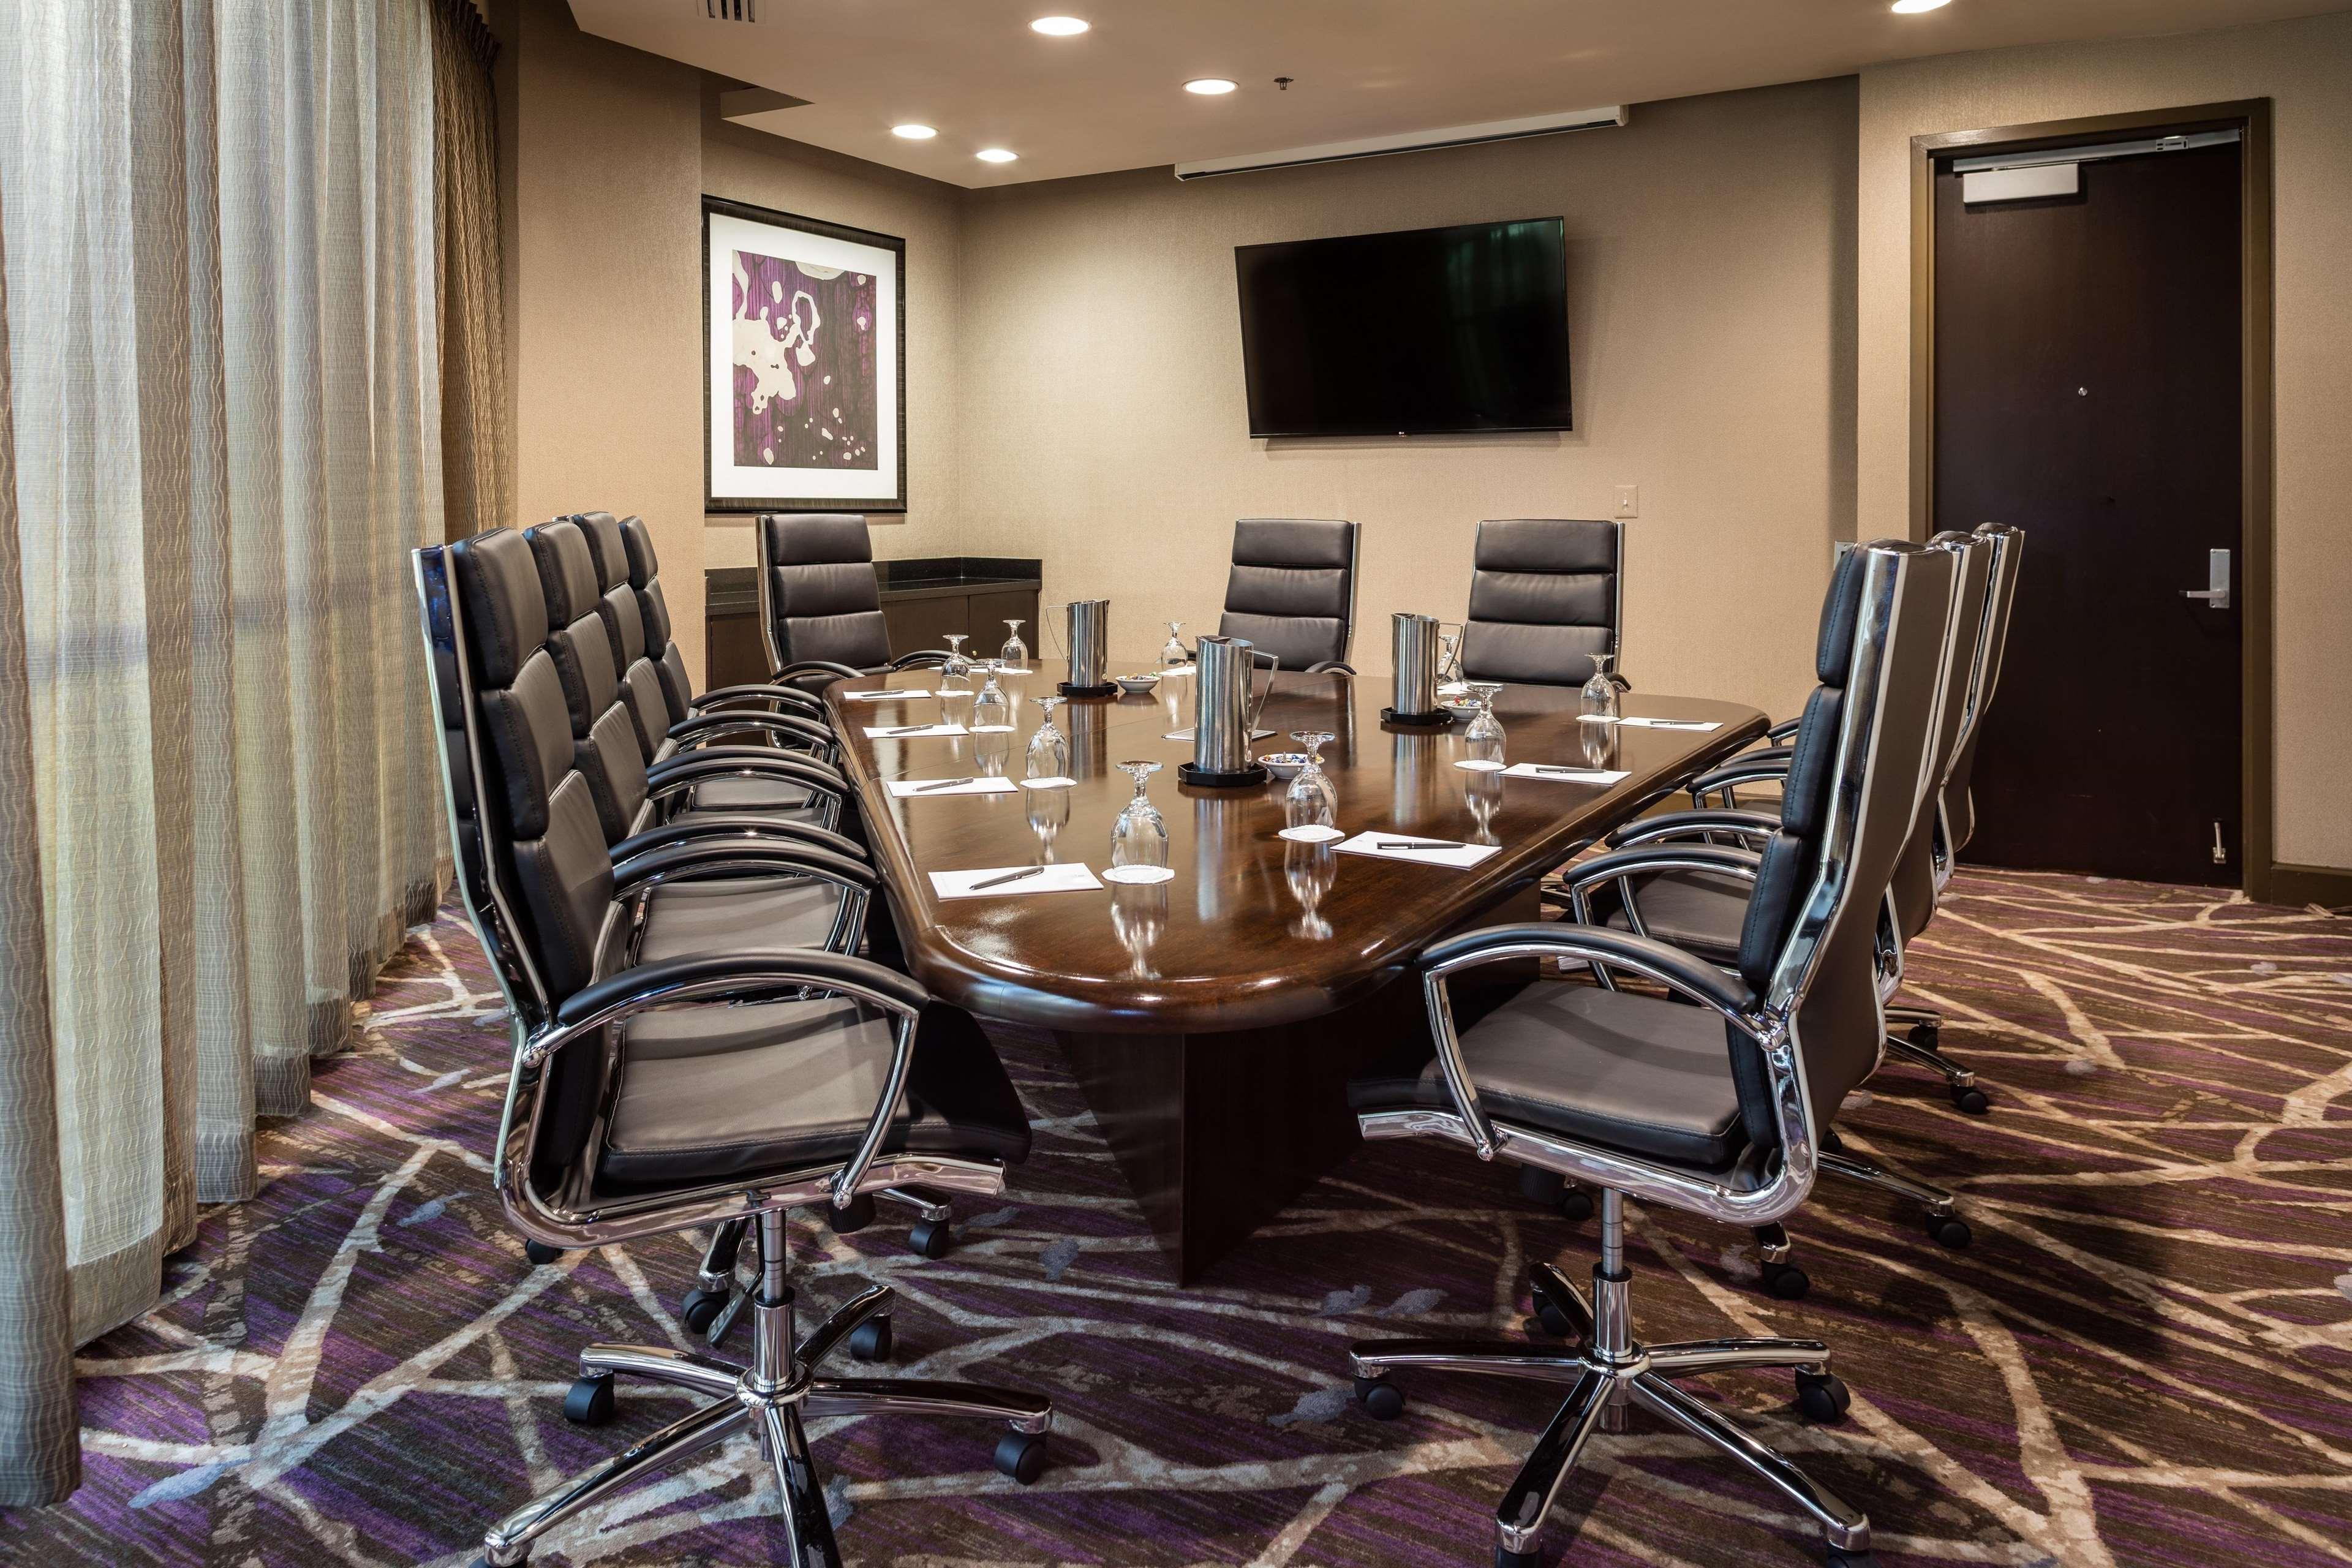 Marriott Lax Room Service Menu